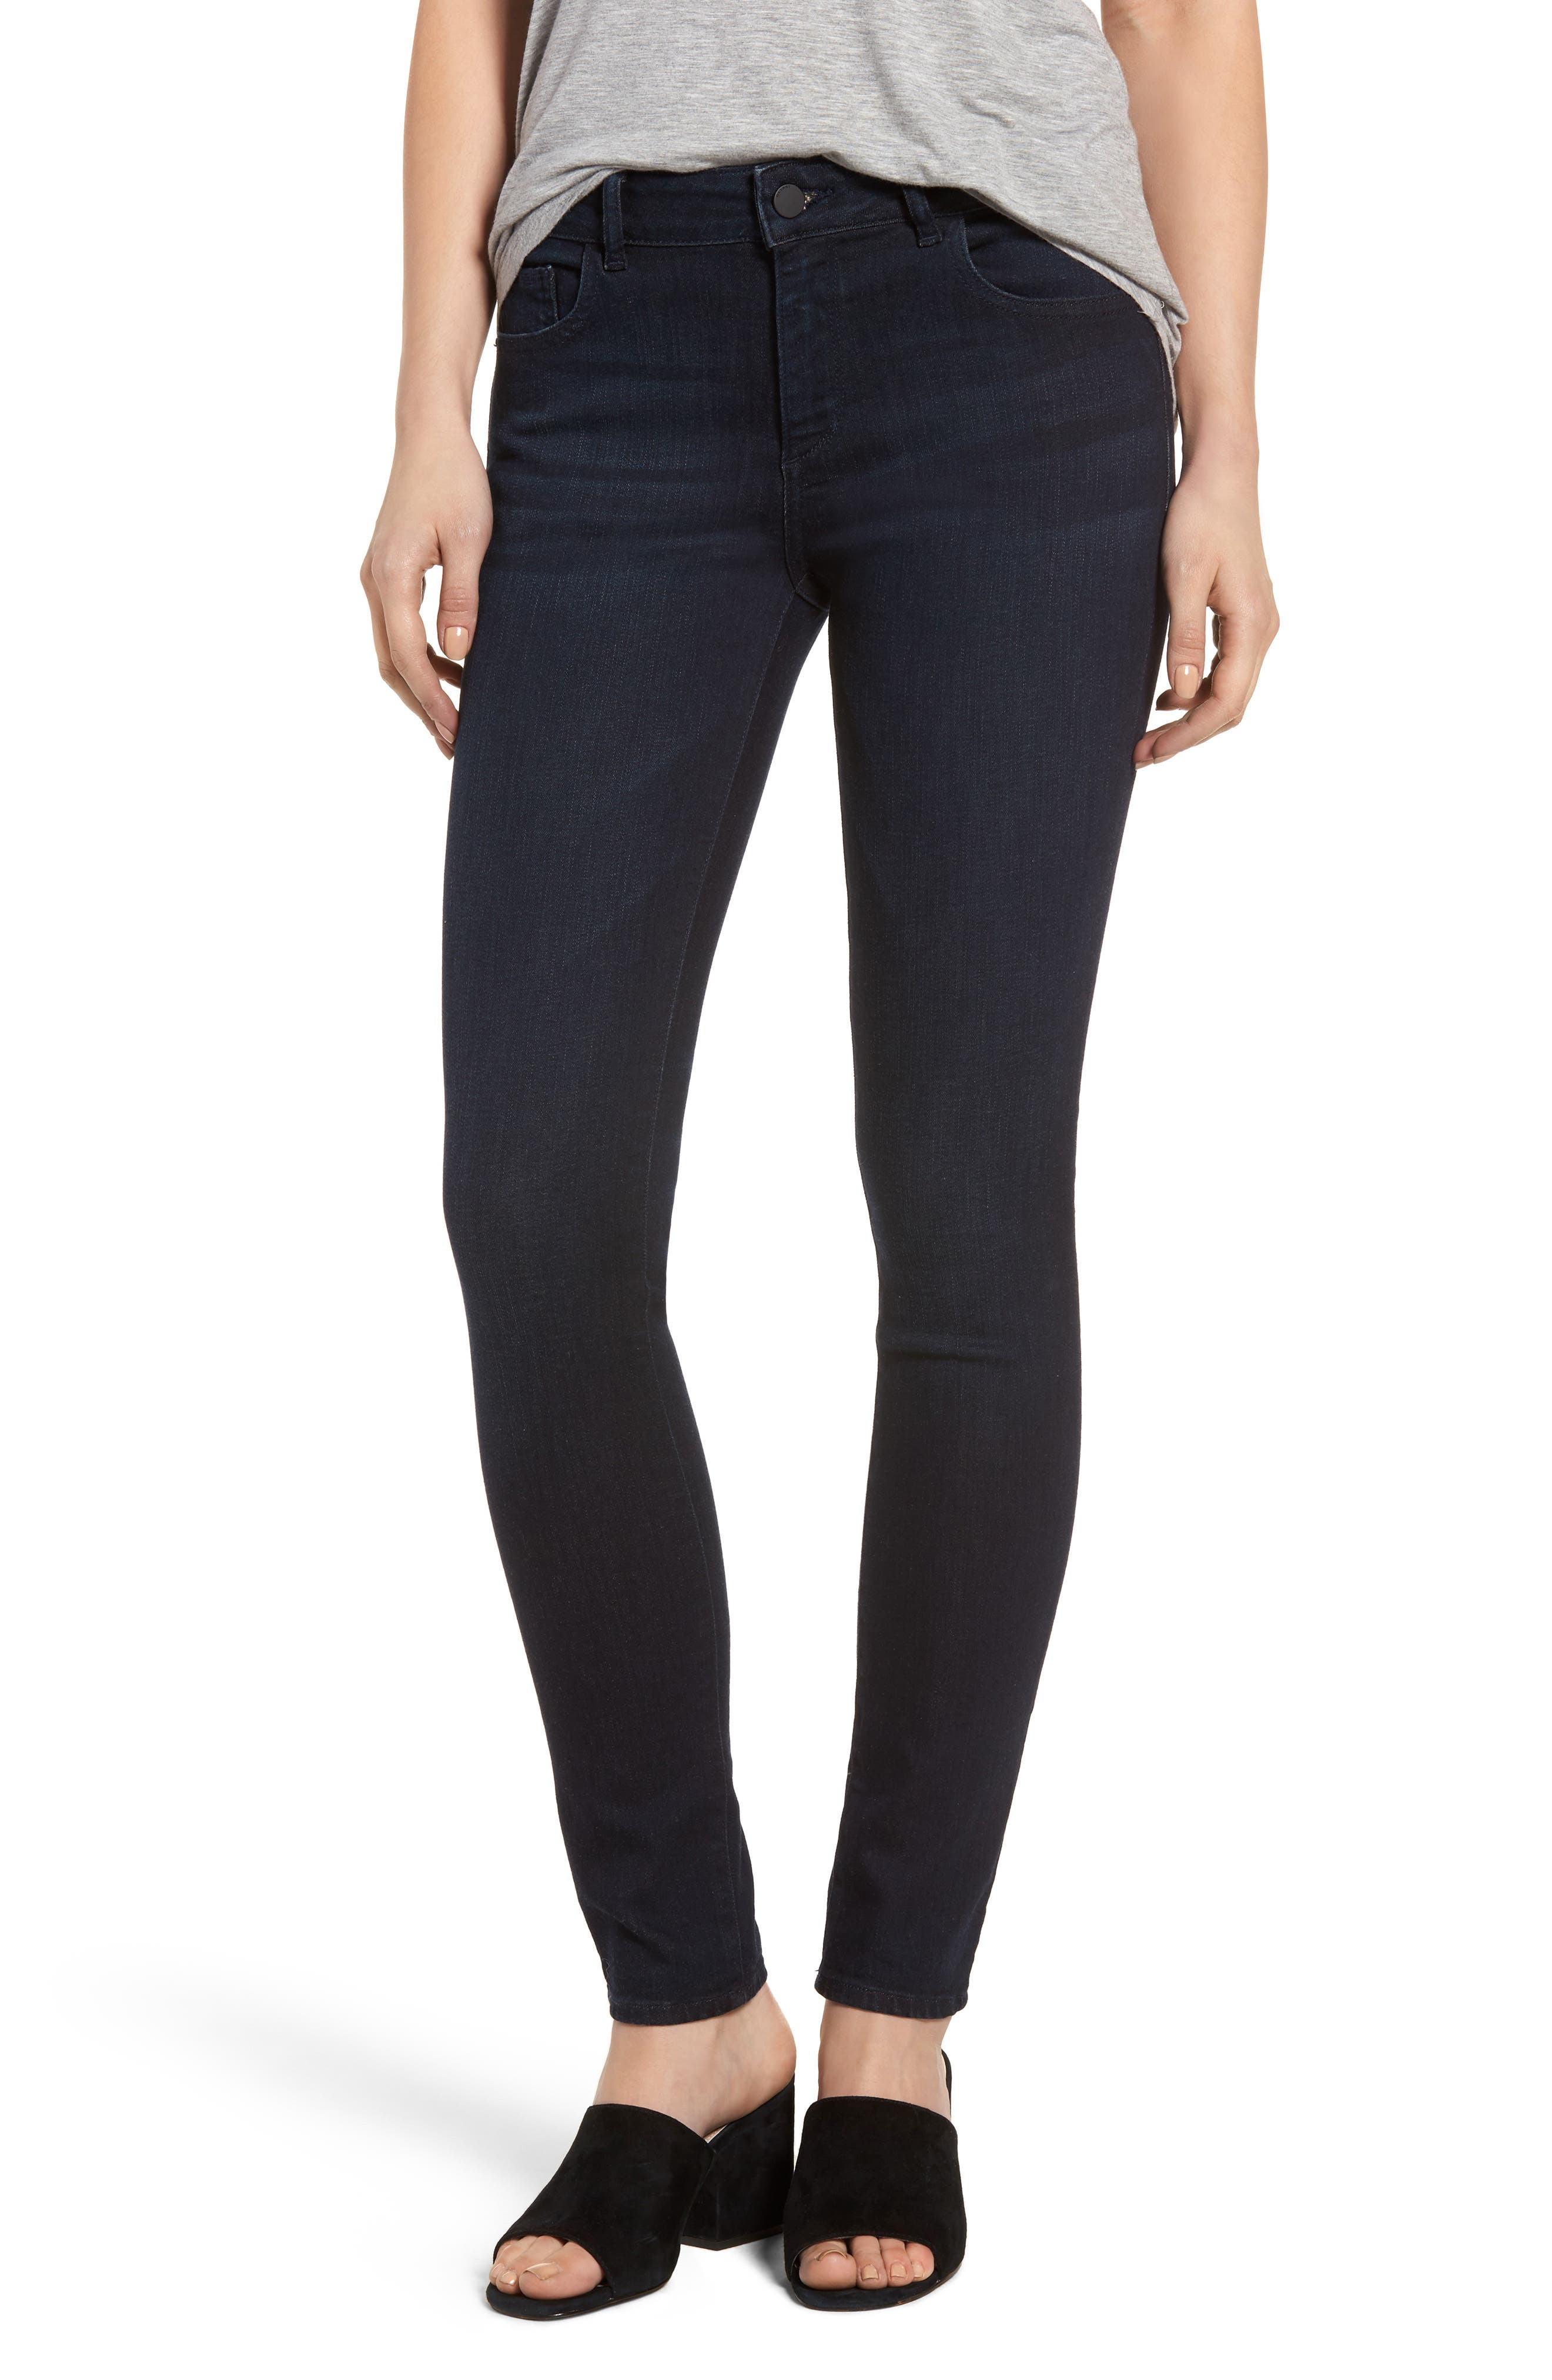 Main Image - DL1961 Florence Instasculpt Skinny Jeans (Carley)